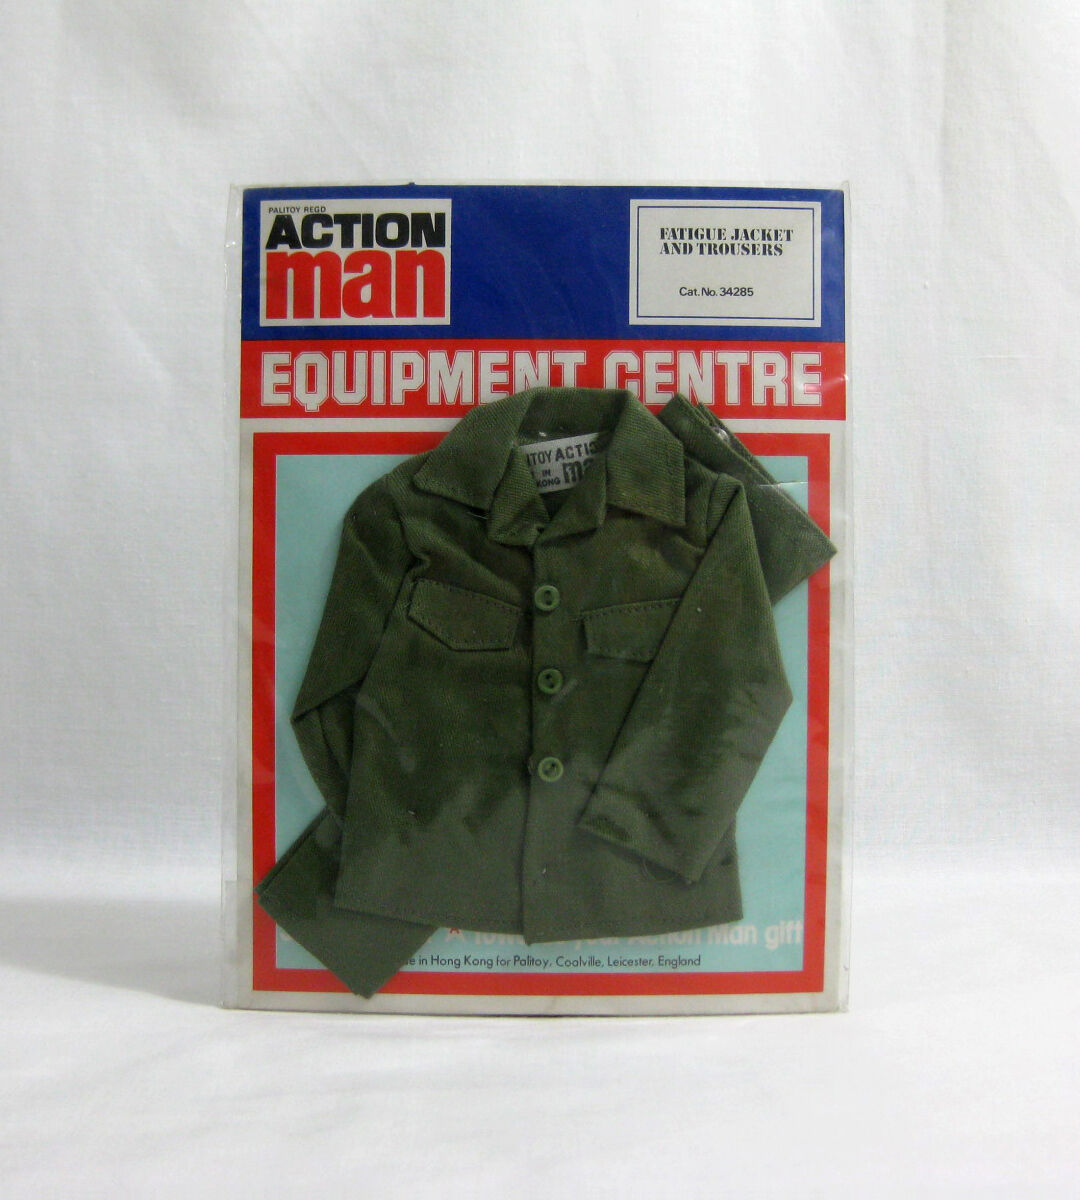 NEW 1970s Action Man ✧ Fatigues ✧ Vintage Equipment Centre MOC  2